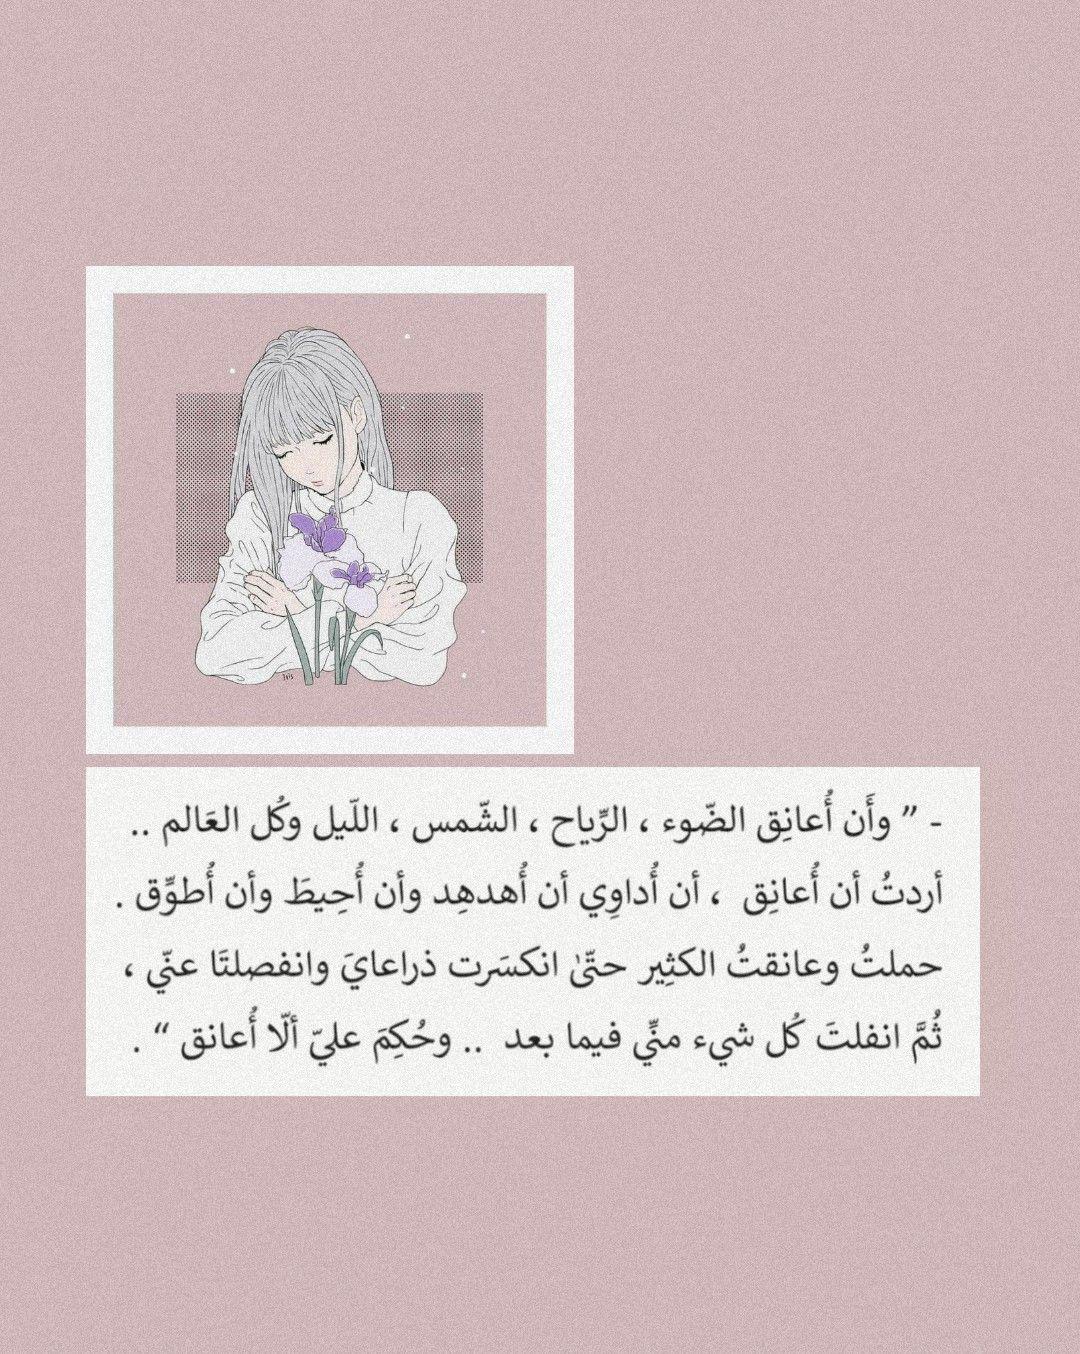 بيت المحر مات أناييس نن Arabic Love Quotes Words Quotes Arabic Funny